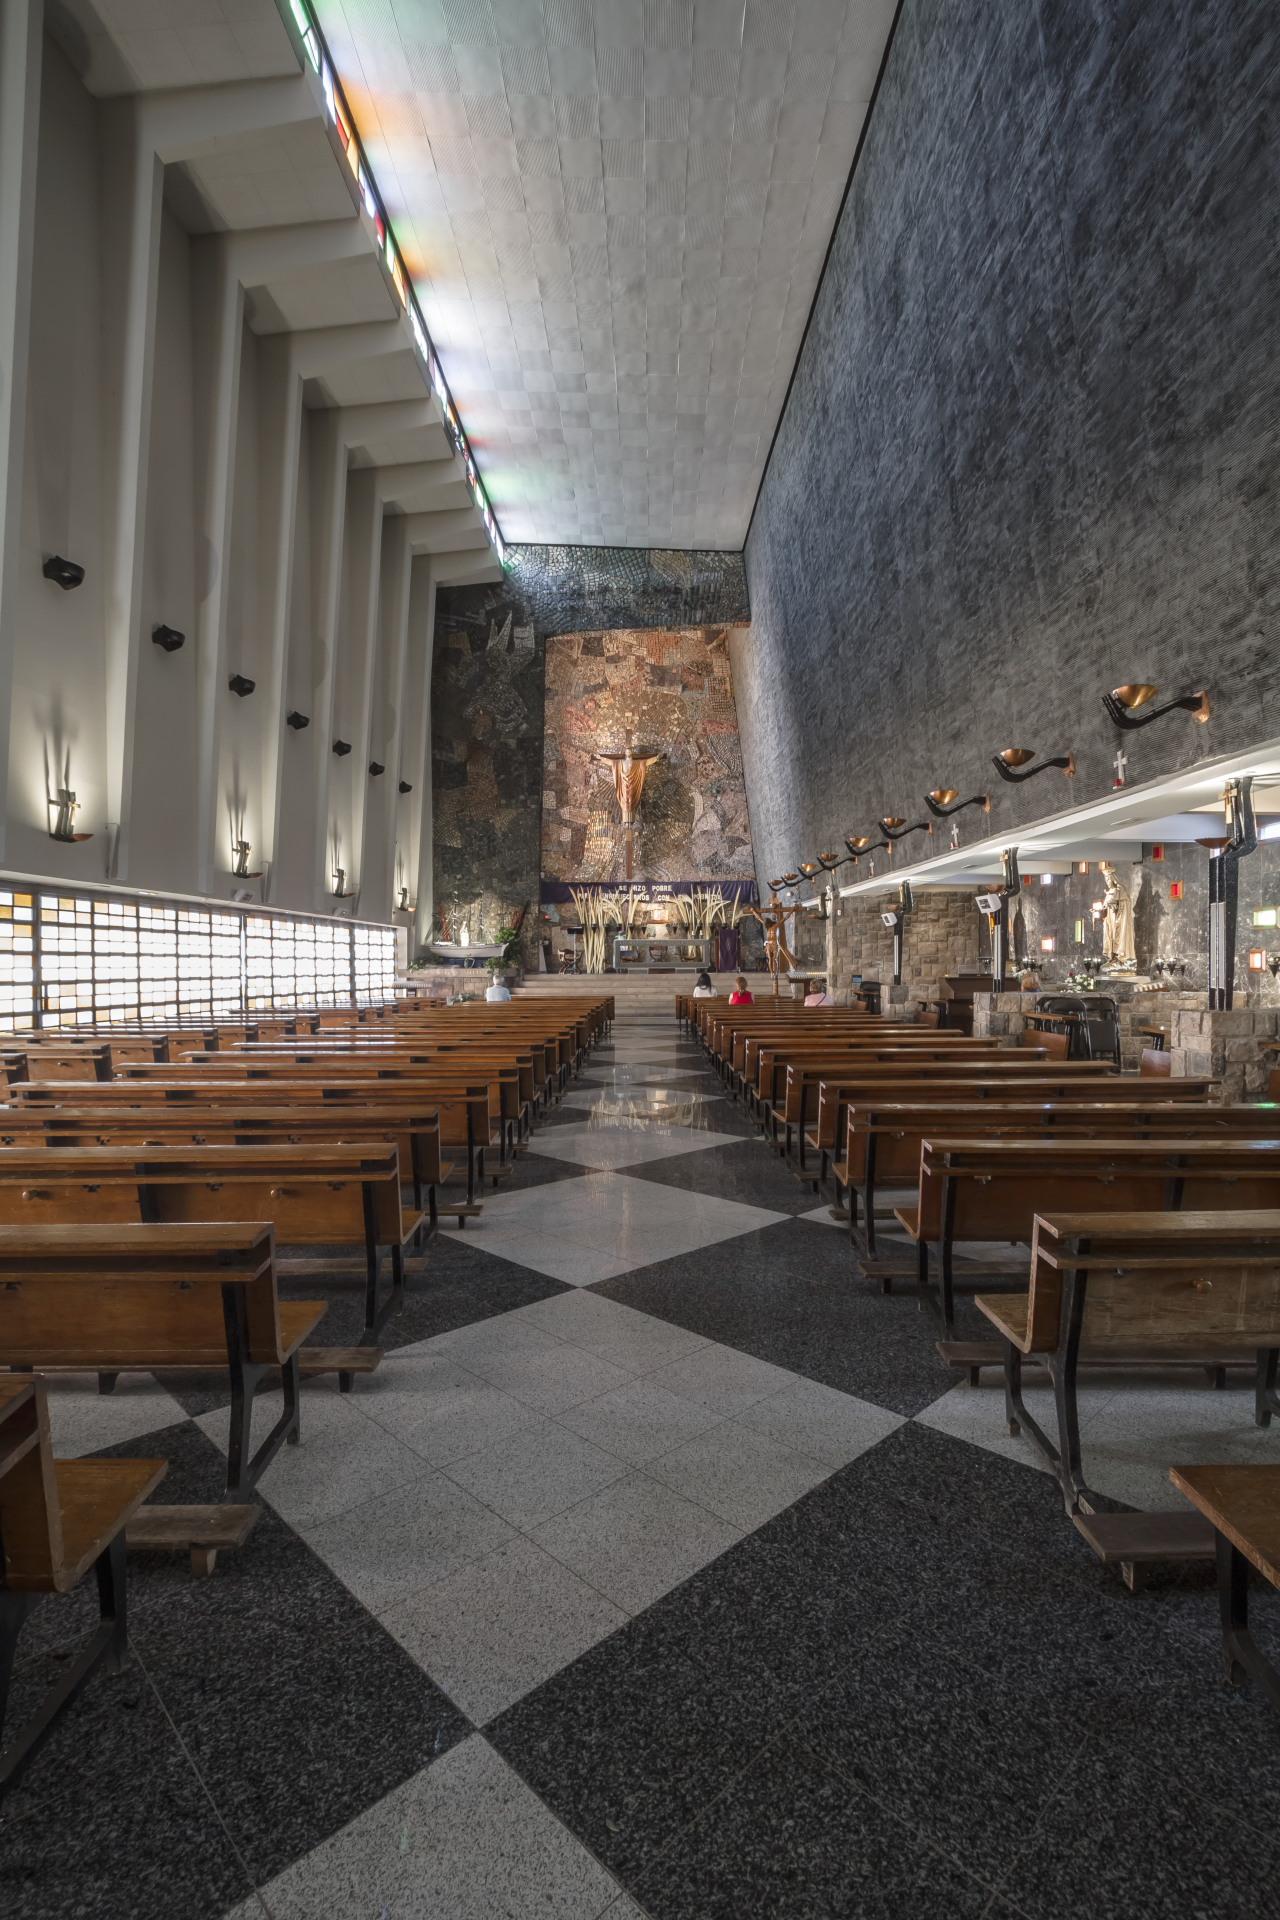 fotografia-arquitectura-valencia-gandia-german-cabo-iglesia-san-nicolas-torroja (11)